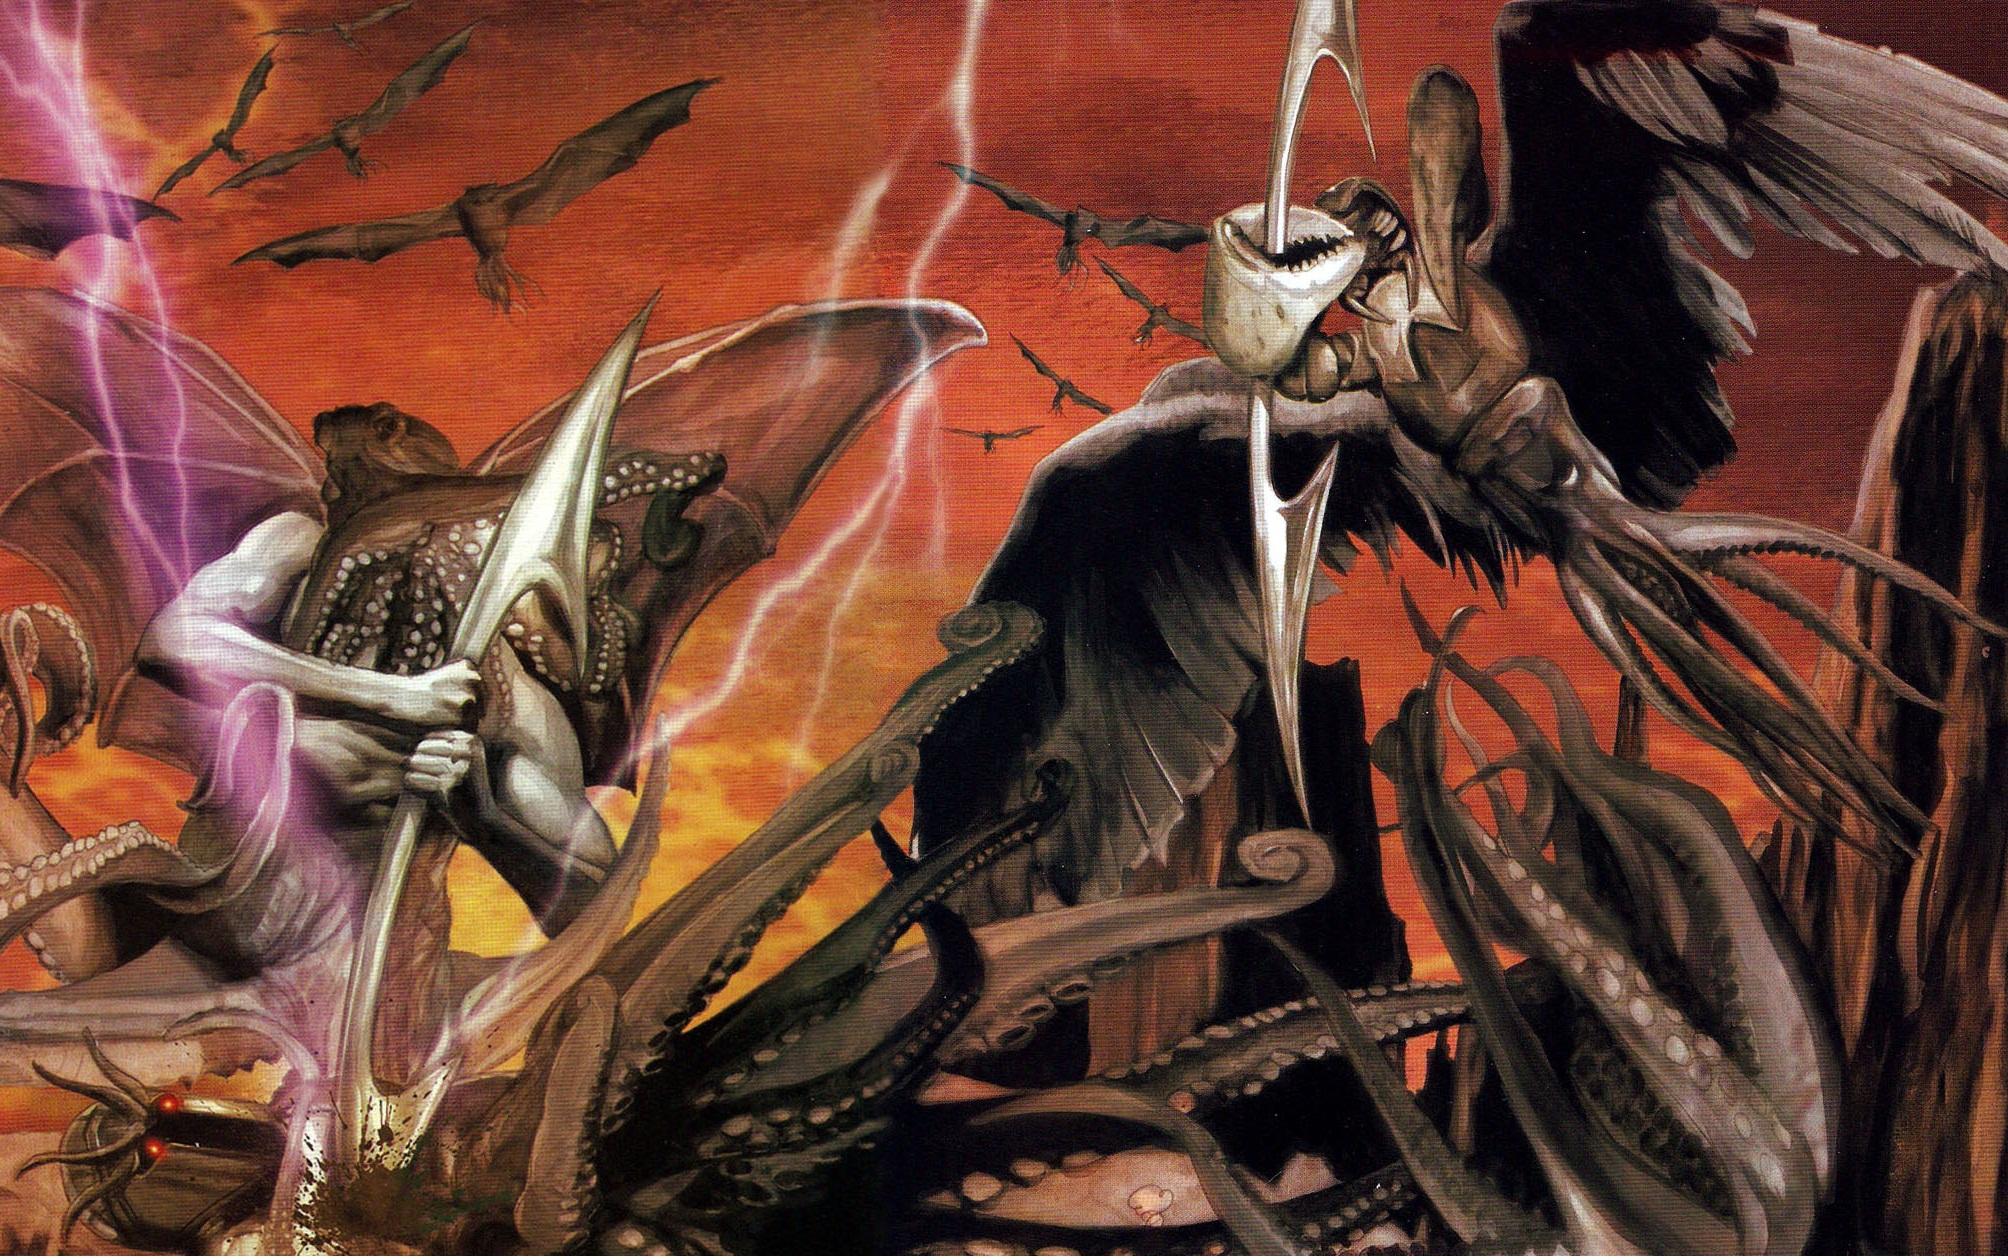 Illyria's killers